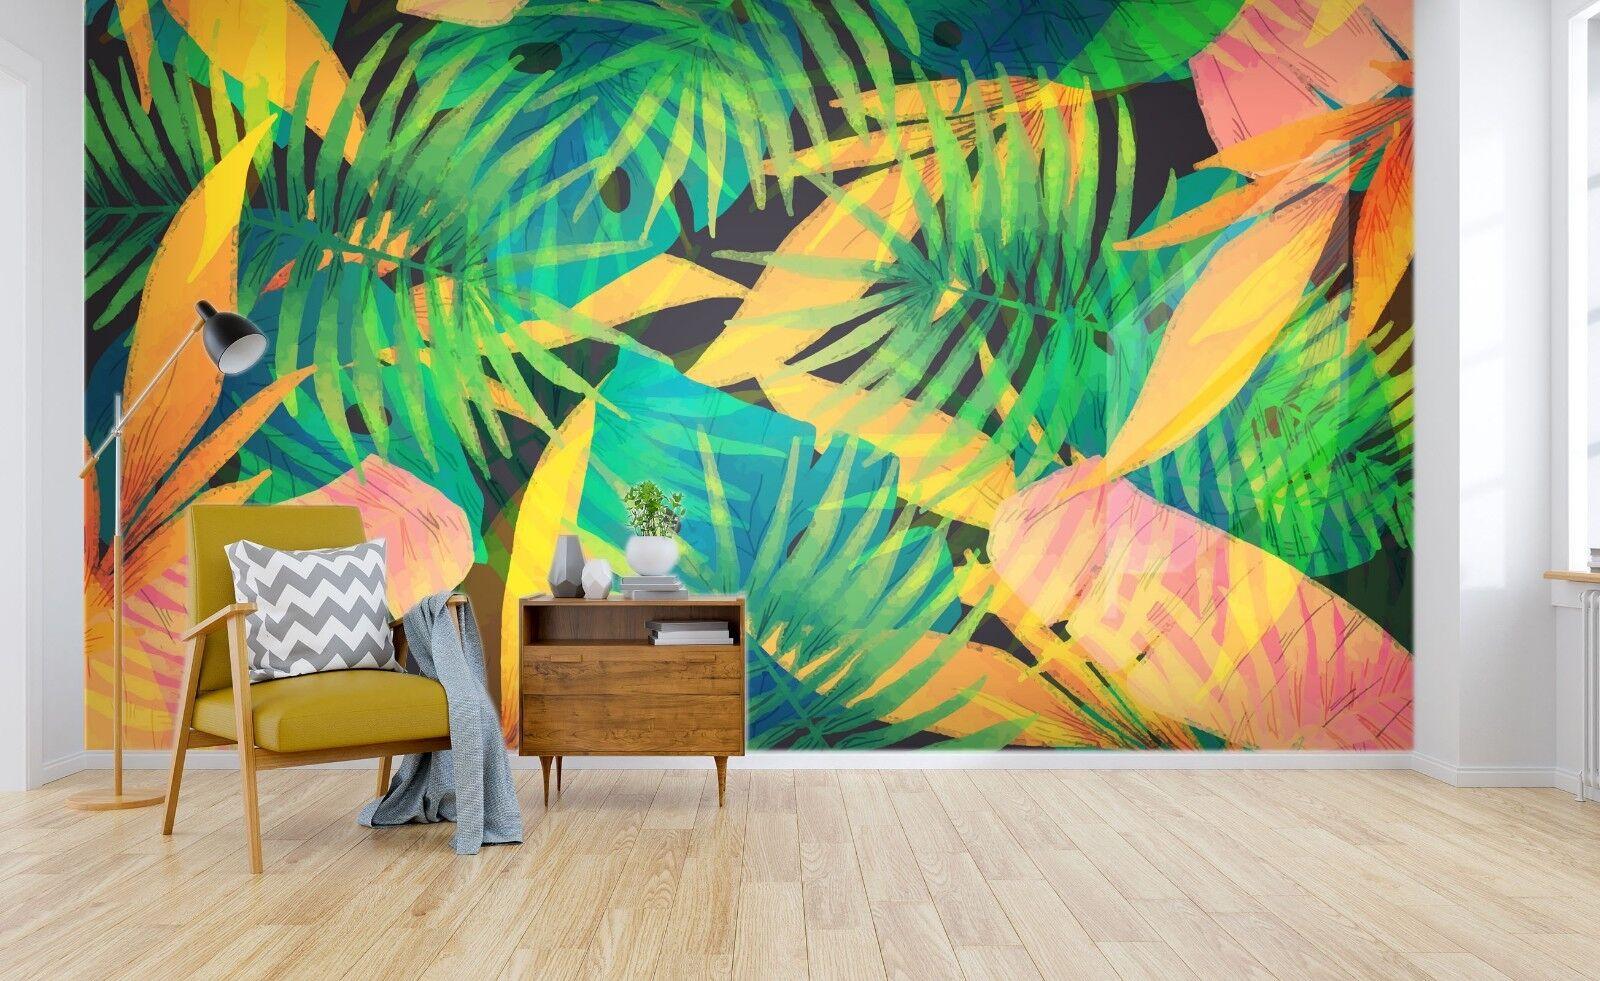 3D Grün Leaves Image 45 Wallpaper Murals Wall Print Wallpaper Mural AJ WALL UK